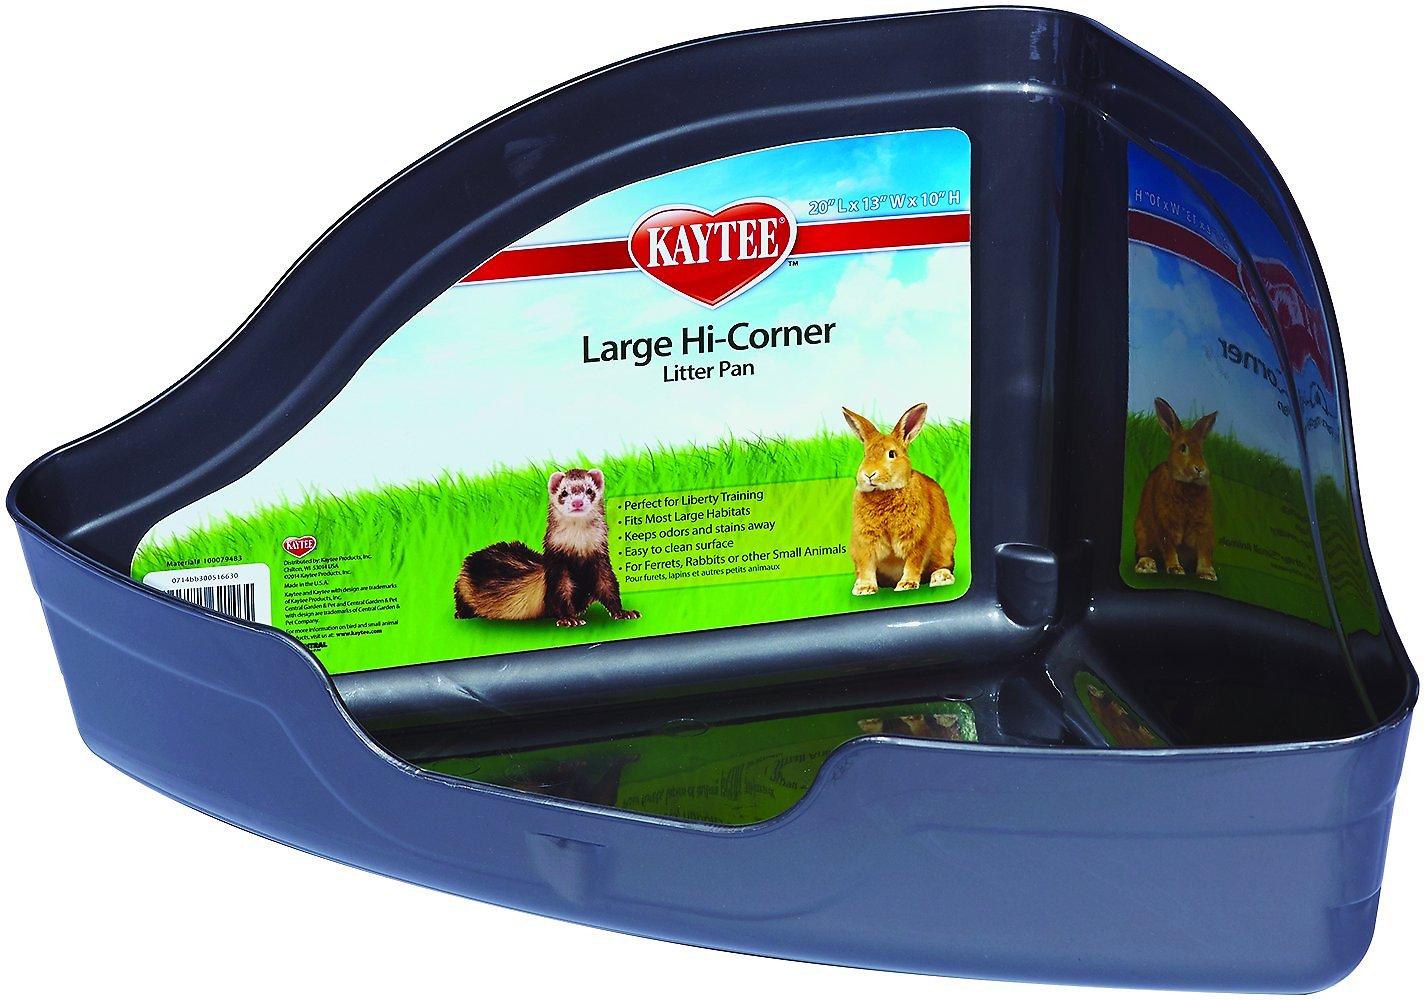 Kaytee Hi-Corner Small Animal Litter Pan, Large, Color Varies